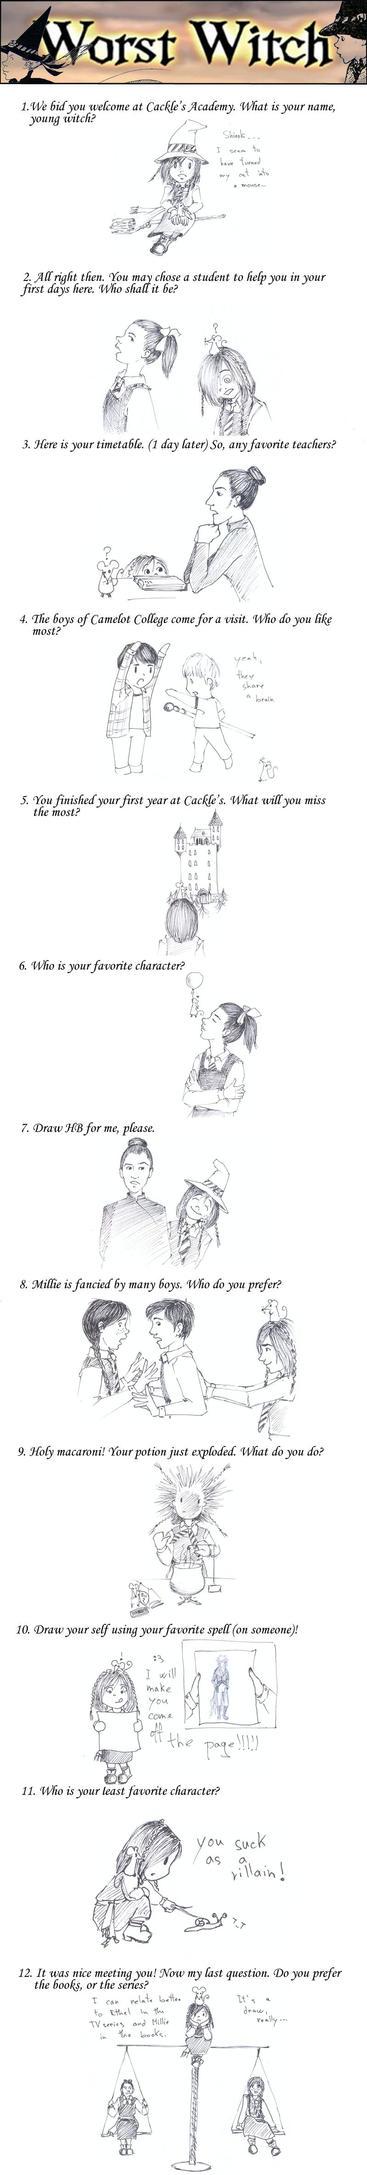 "Фанарт по ""Самой плохой ведьме"" - Страница 3 Meme__the_worst_witch_by_silverrosekitsuneinu-d417971"